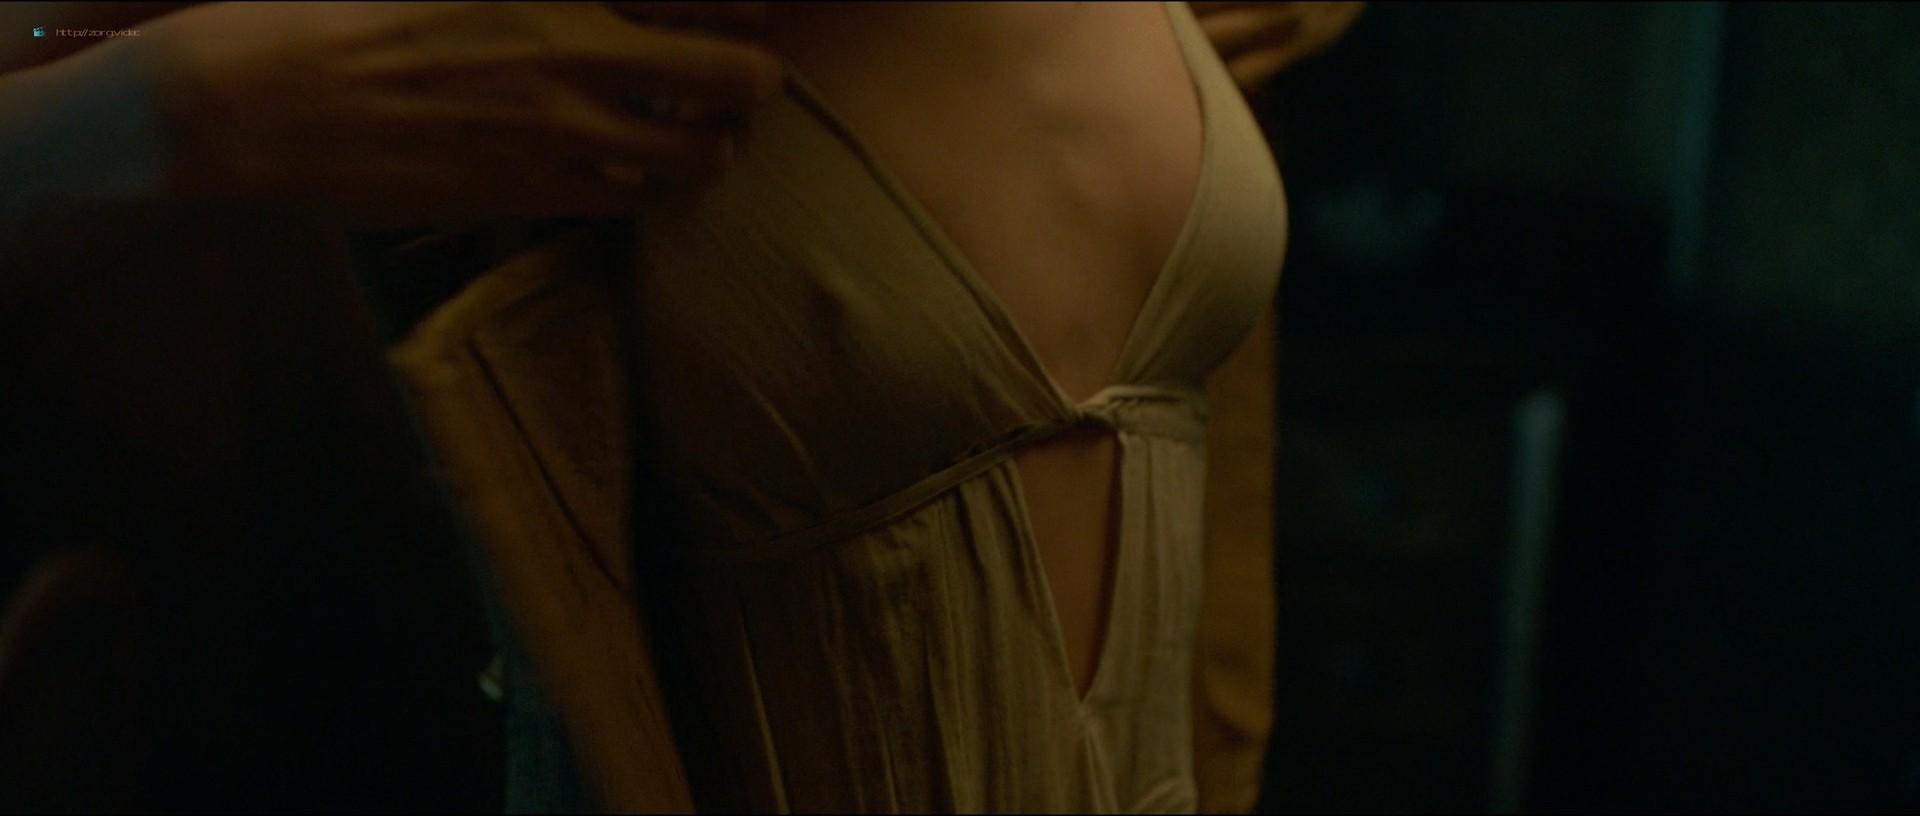 Maeve Dermody nude sex Karla Crome nude too - Carnival Row (2019) s1e1 HD 1080p (3)